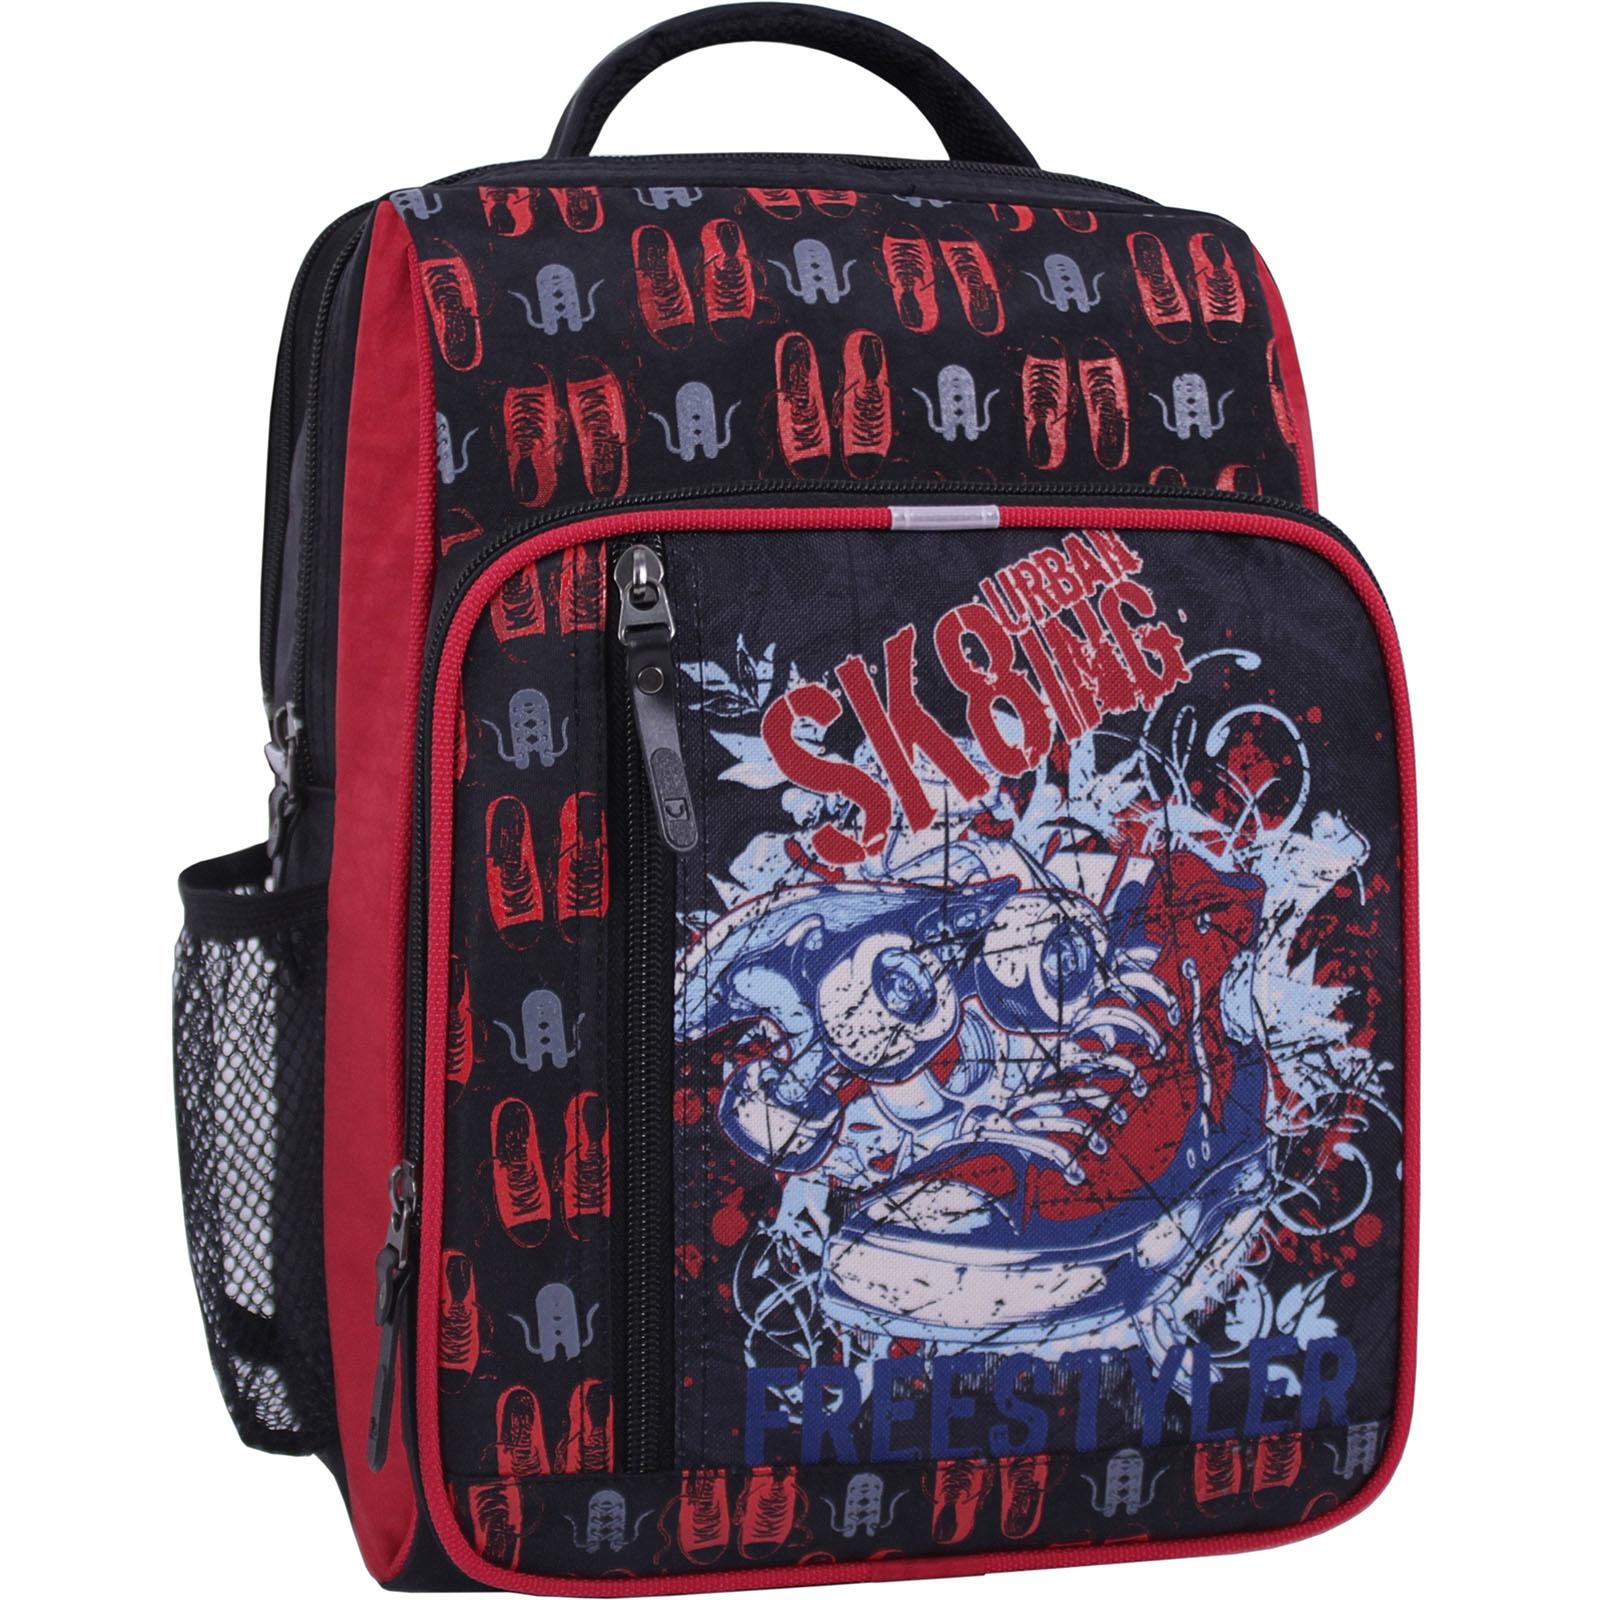 Школьные рюкзаки Рюкзак школьный Bagland Школьник 8 л. черный 609 (0012870) IMG_0975_суб.609_.JPG